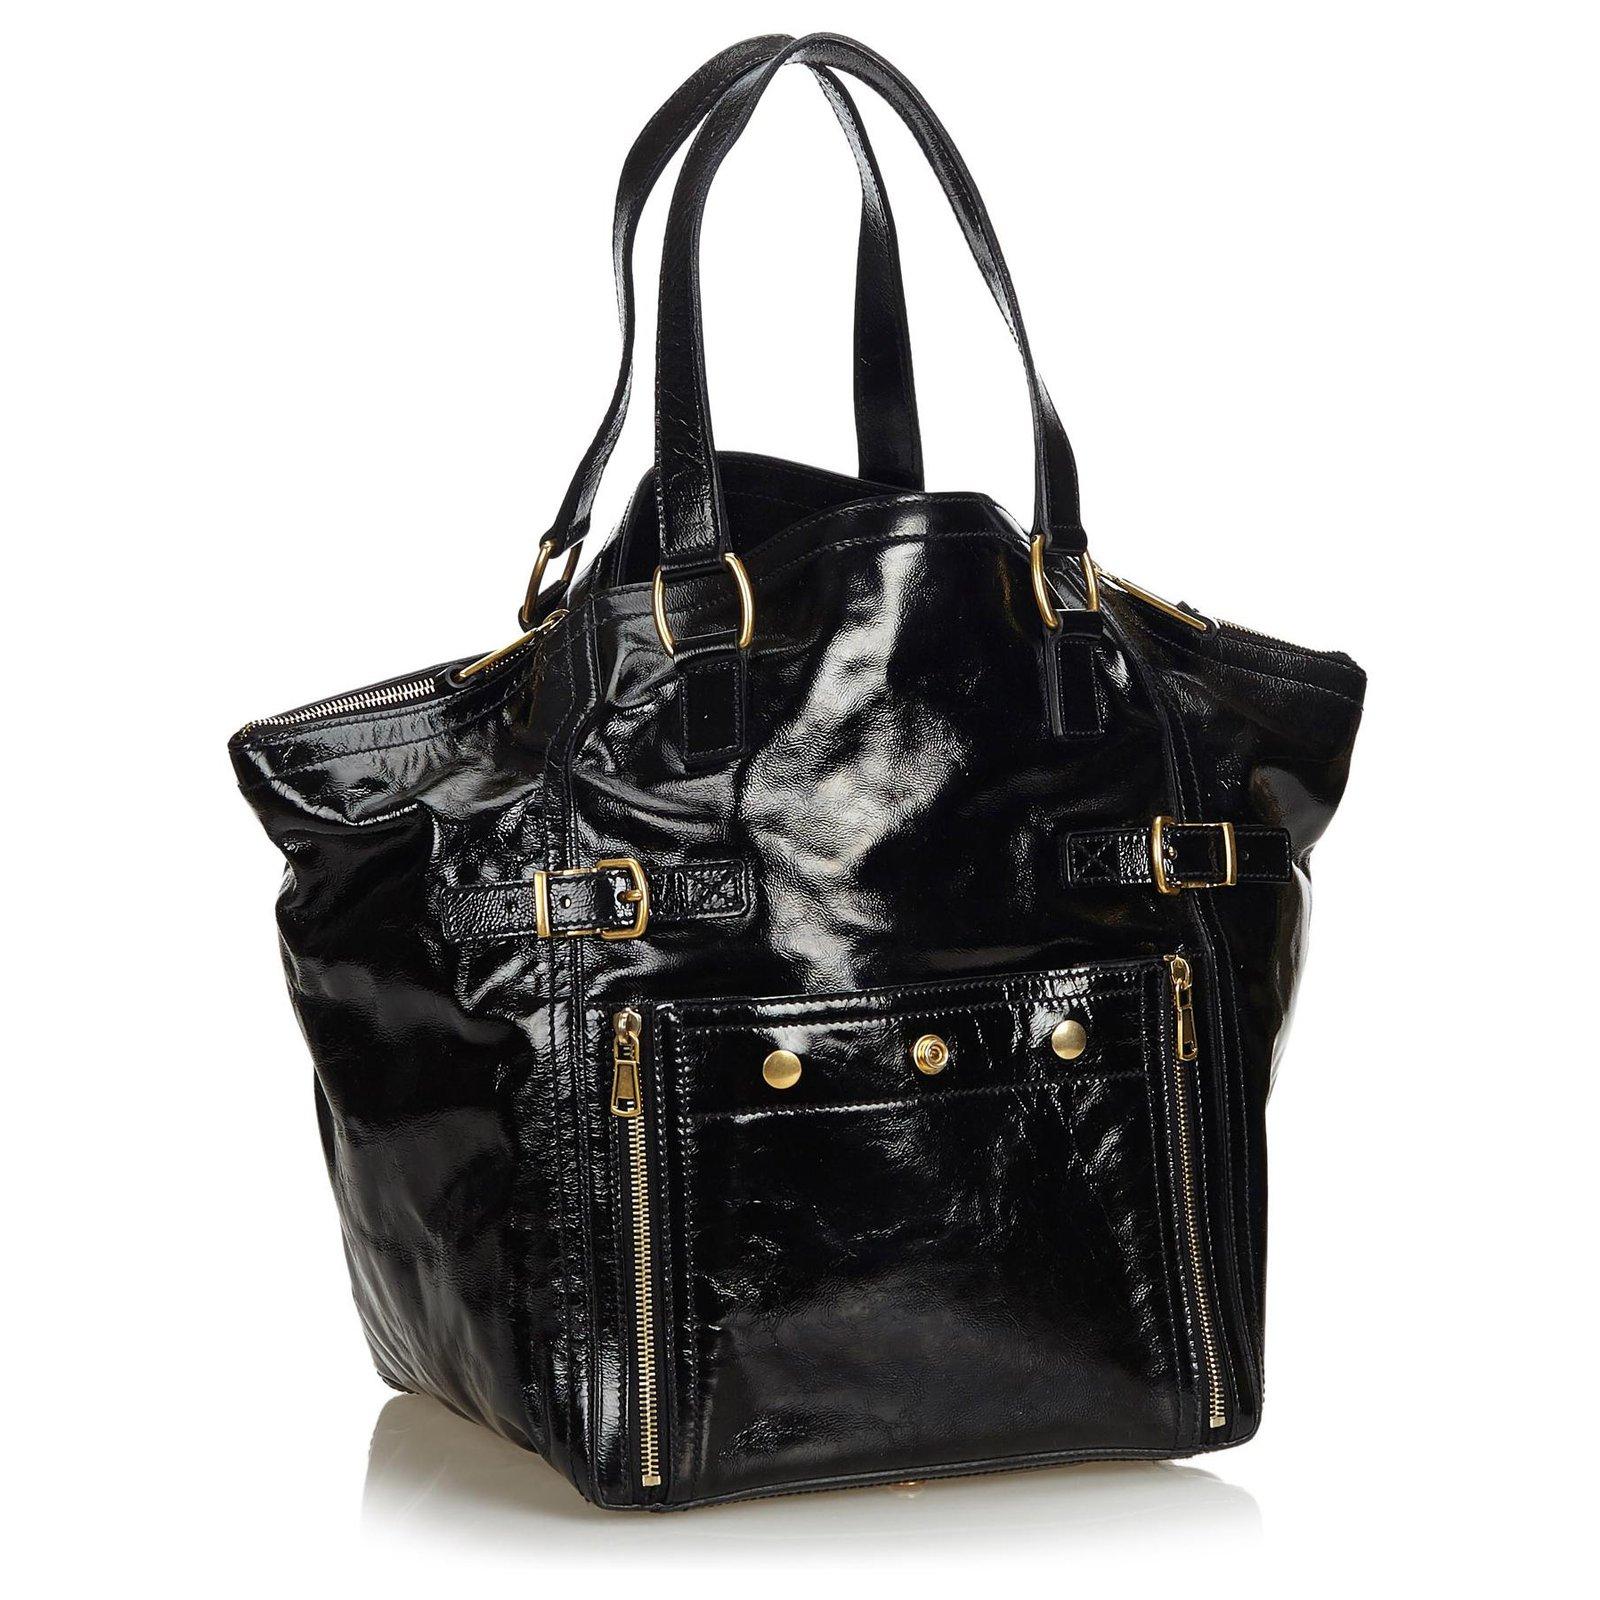 adcd0ff39 Yves Saint Laurent YSL Black Patent Leather Downtown Tote Totes Leather,Patent  leather Black ref.123285 - Joli Closet